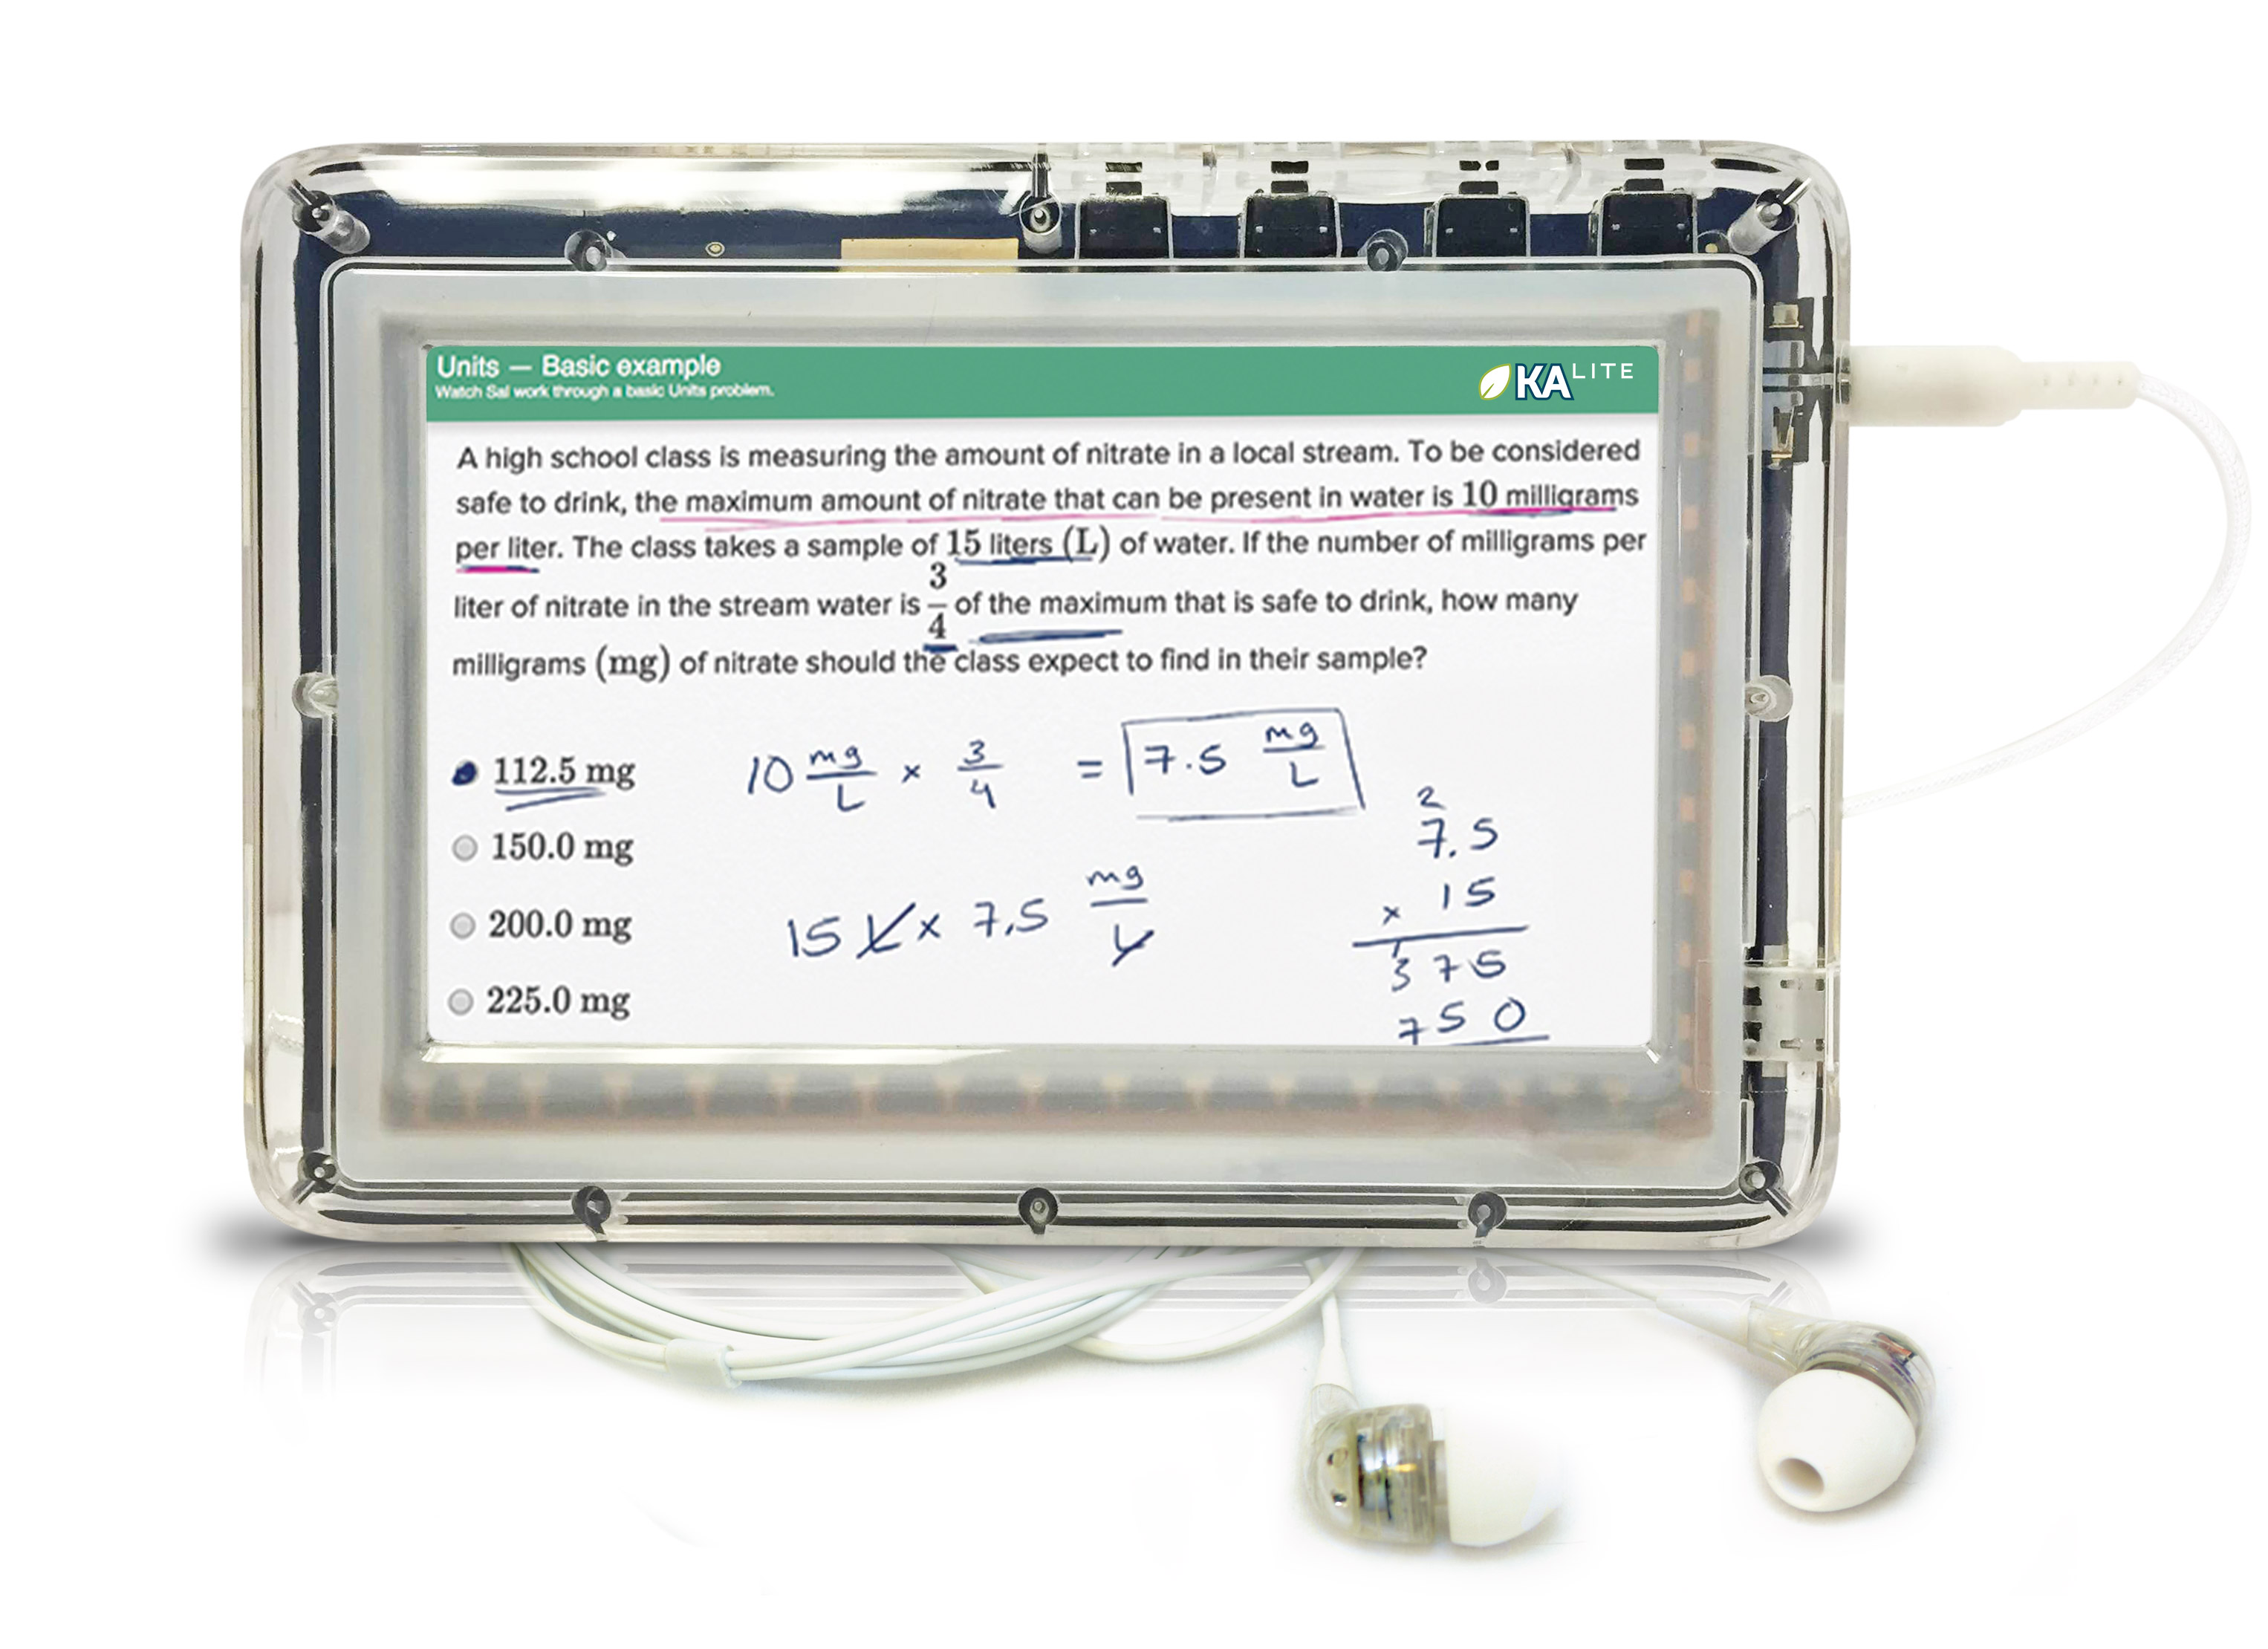 Jpay Tablet Unlock Code